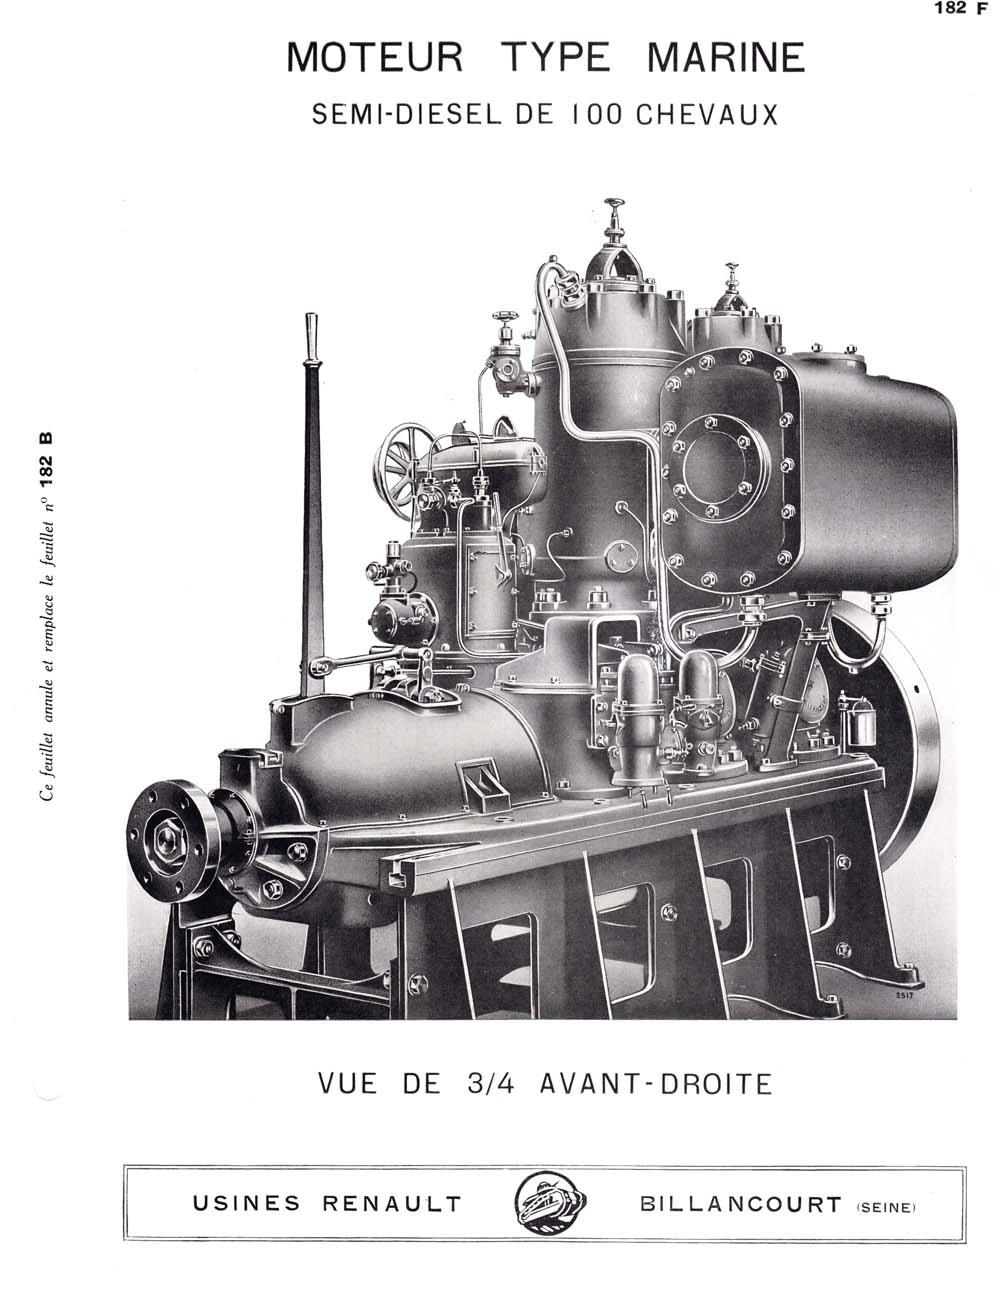 moteur_marine_demidiesel_100cv_3